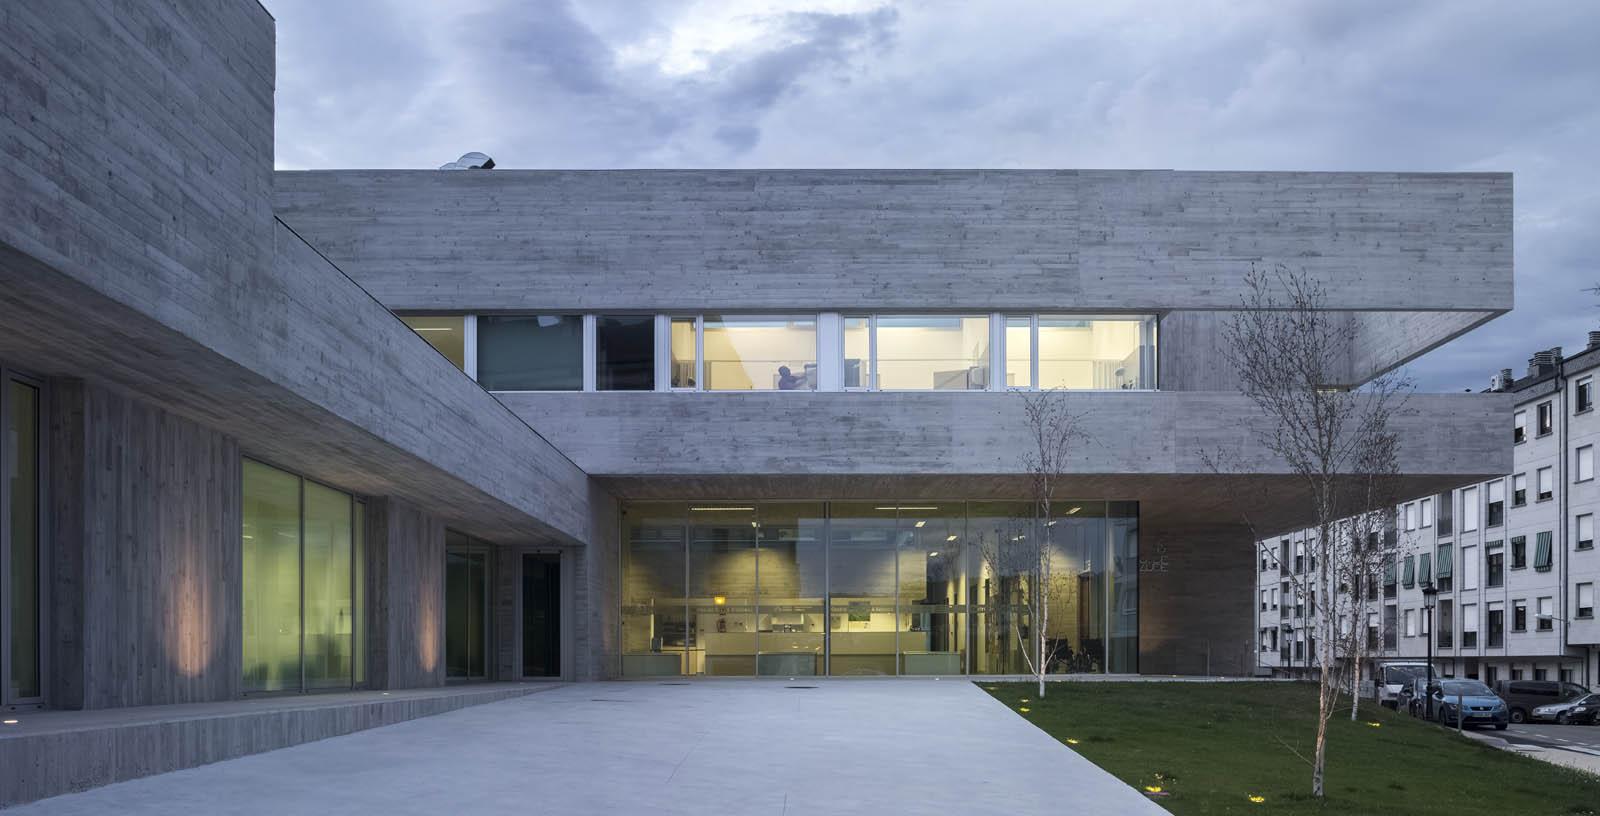 Valenza__Health_Center_007_Architecture_IDOM_Copyright_Aitor_Ortiz